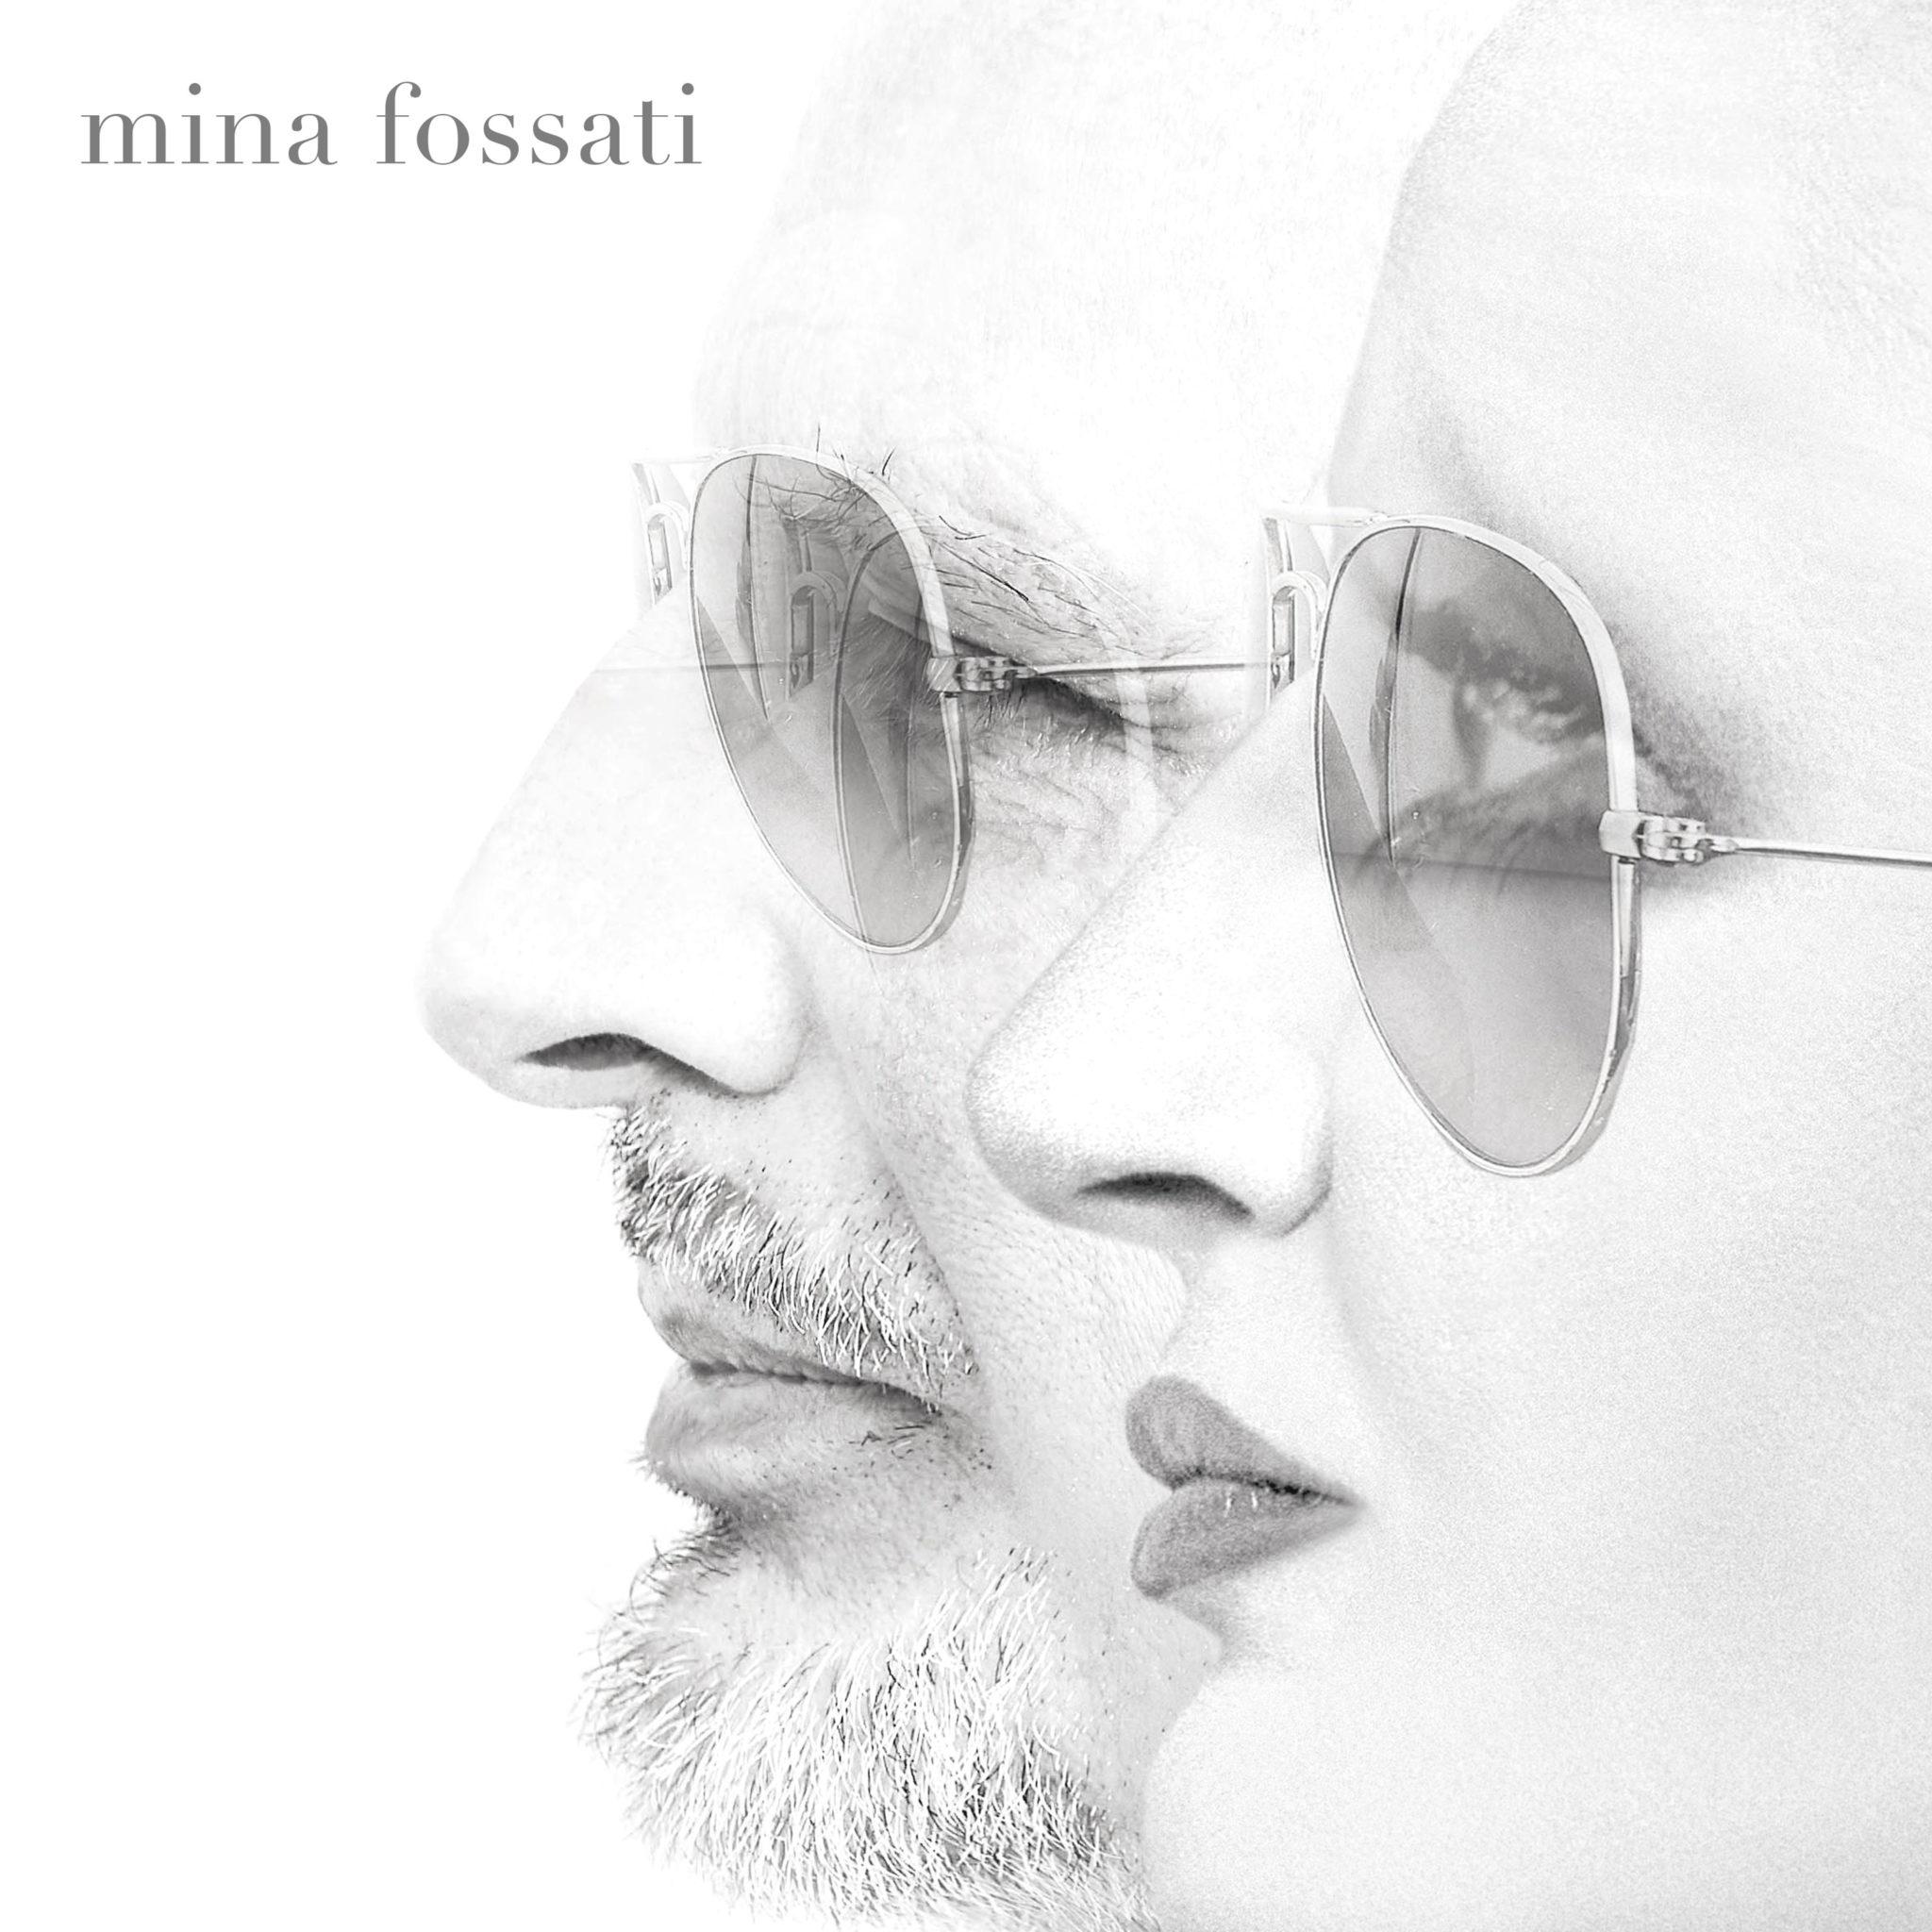 Mina Fossati, finalmente insieme